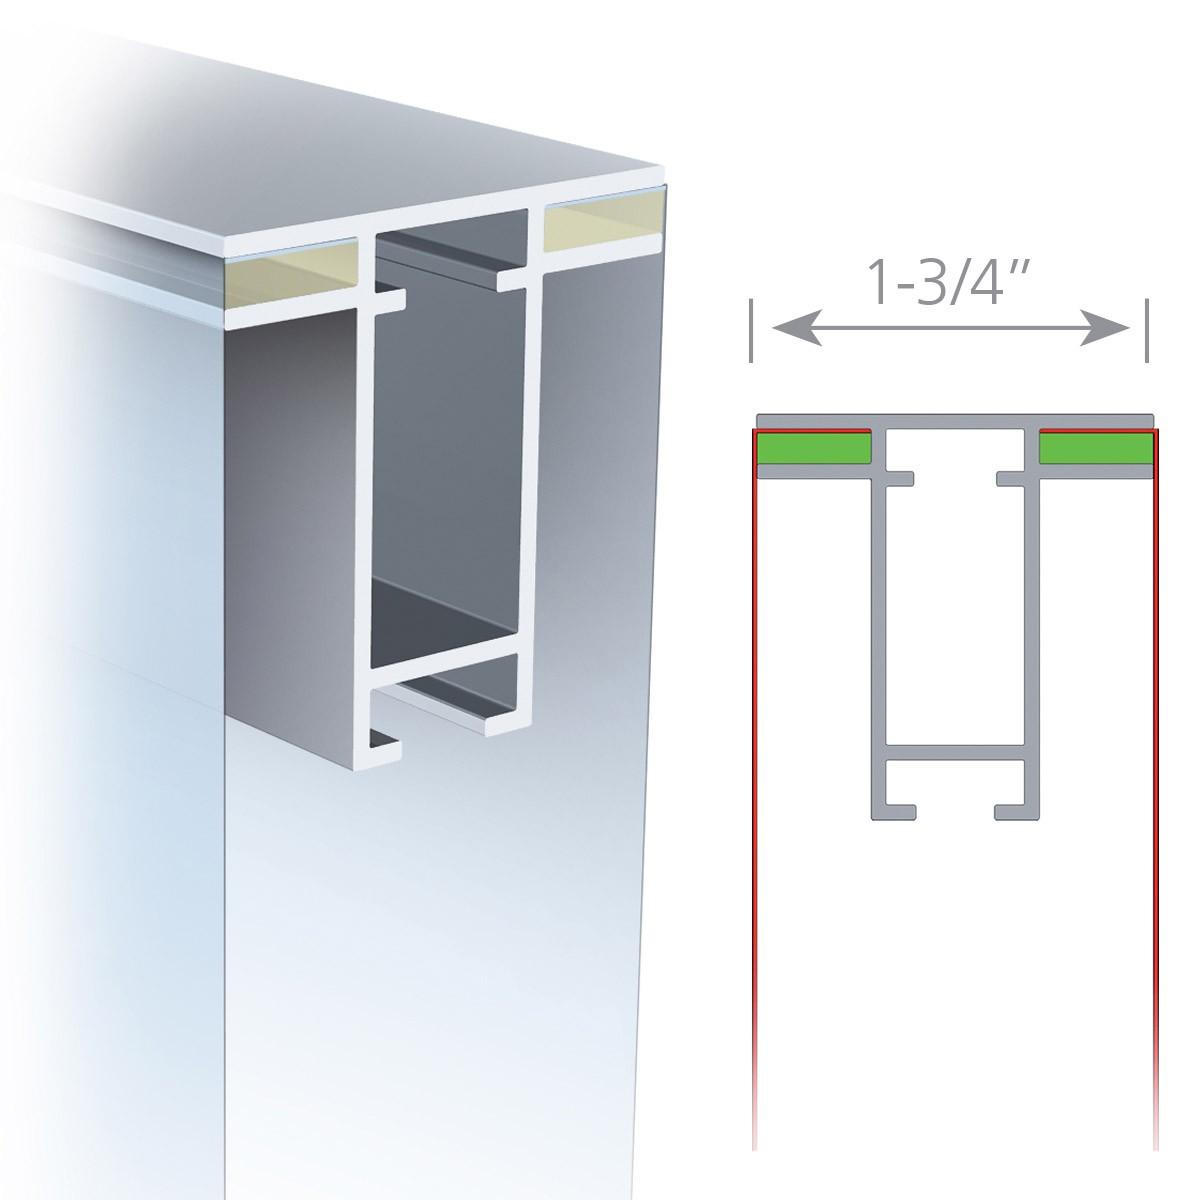 Charisma 36x72 Double Sided SEG Fabric Frame